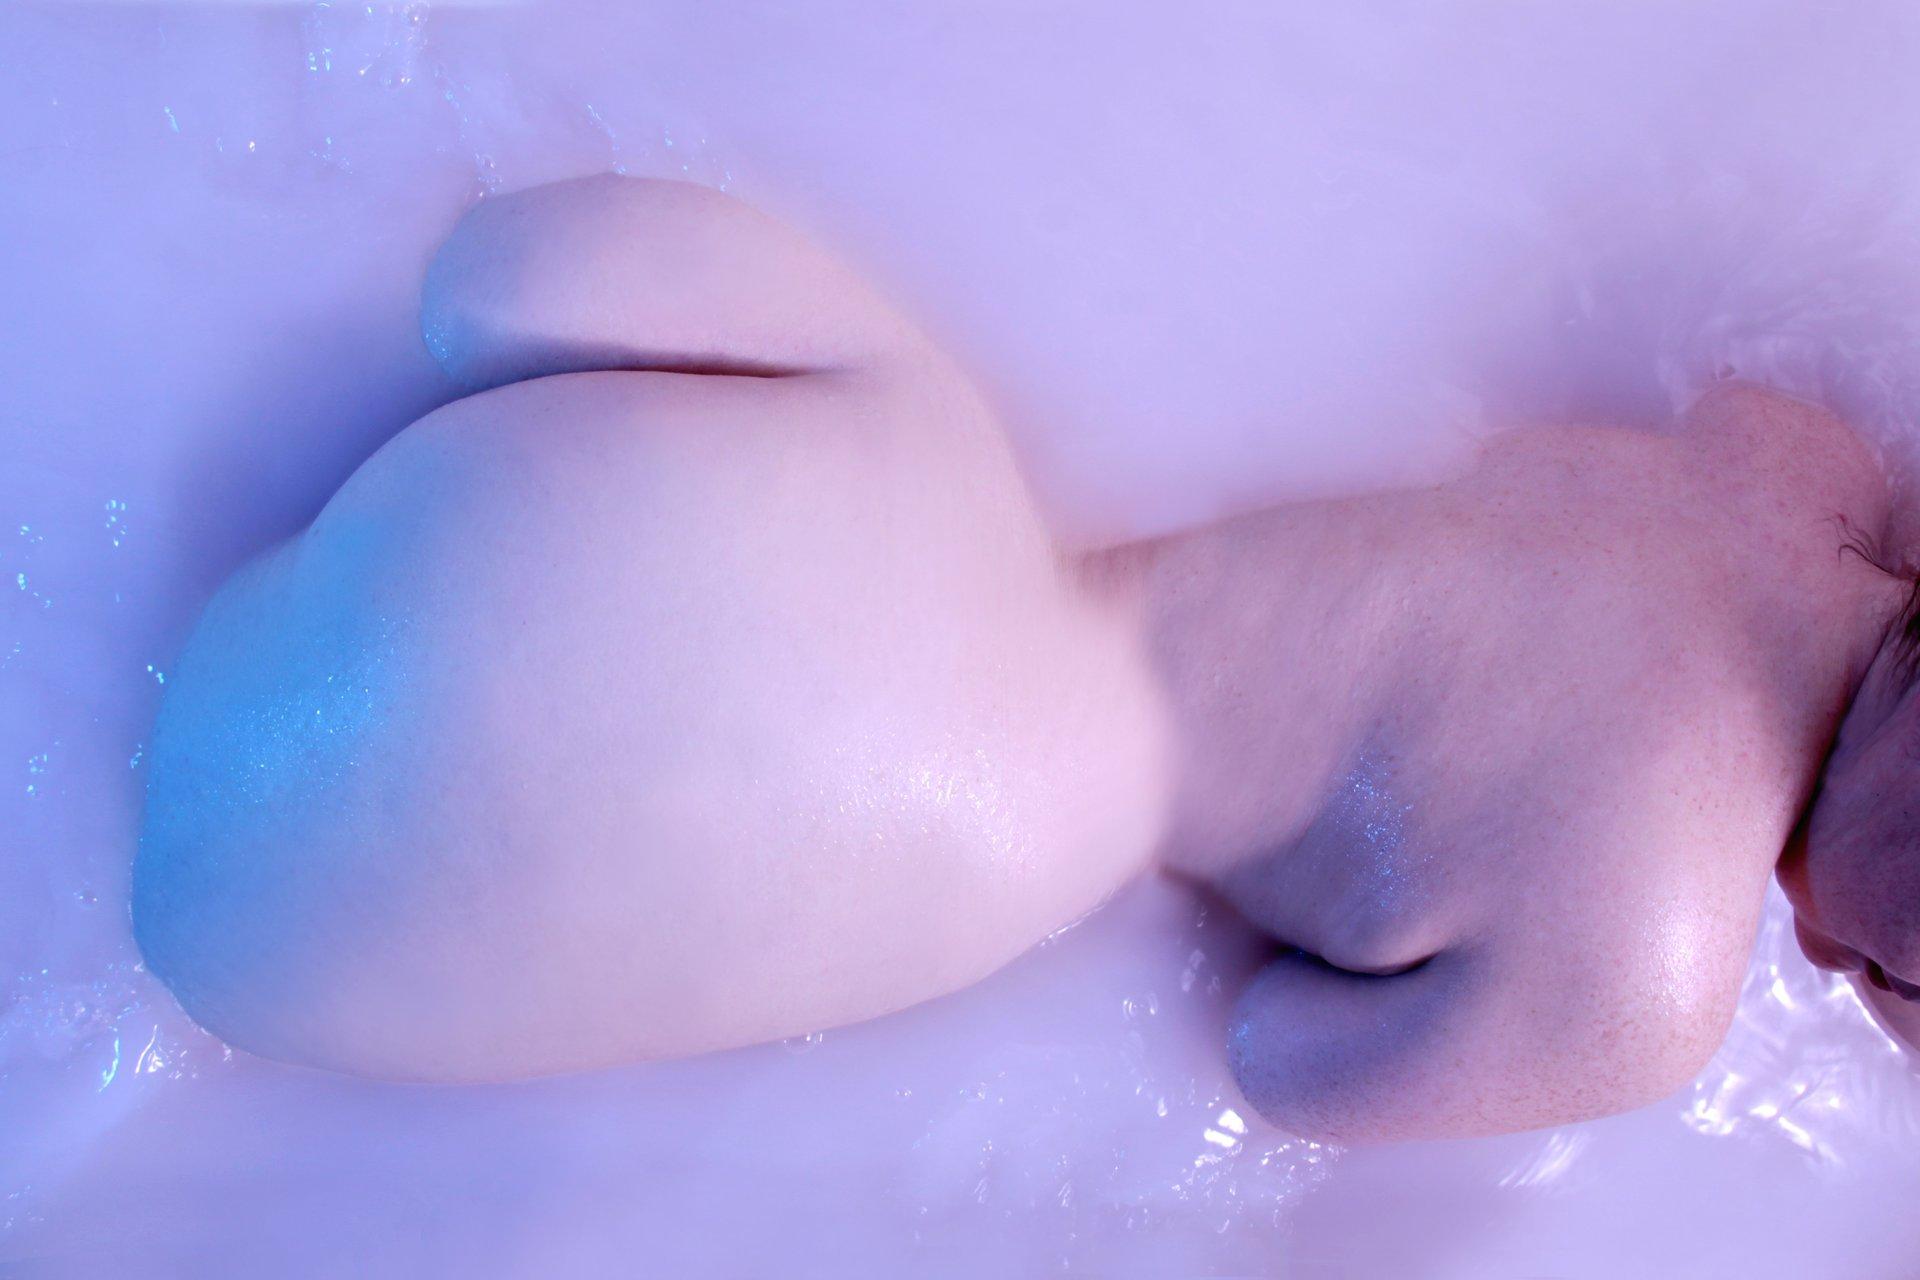 mollig ist sexy Aktfotos, Aktfotografie, Akt, Aktfotograf, Fotostudio, Fototermin, Eschau, Frankfurt, Würzburg, Miltenberg, Aschaffenburg, Darmstadt, Fulda